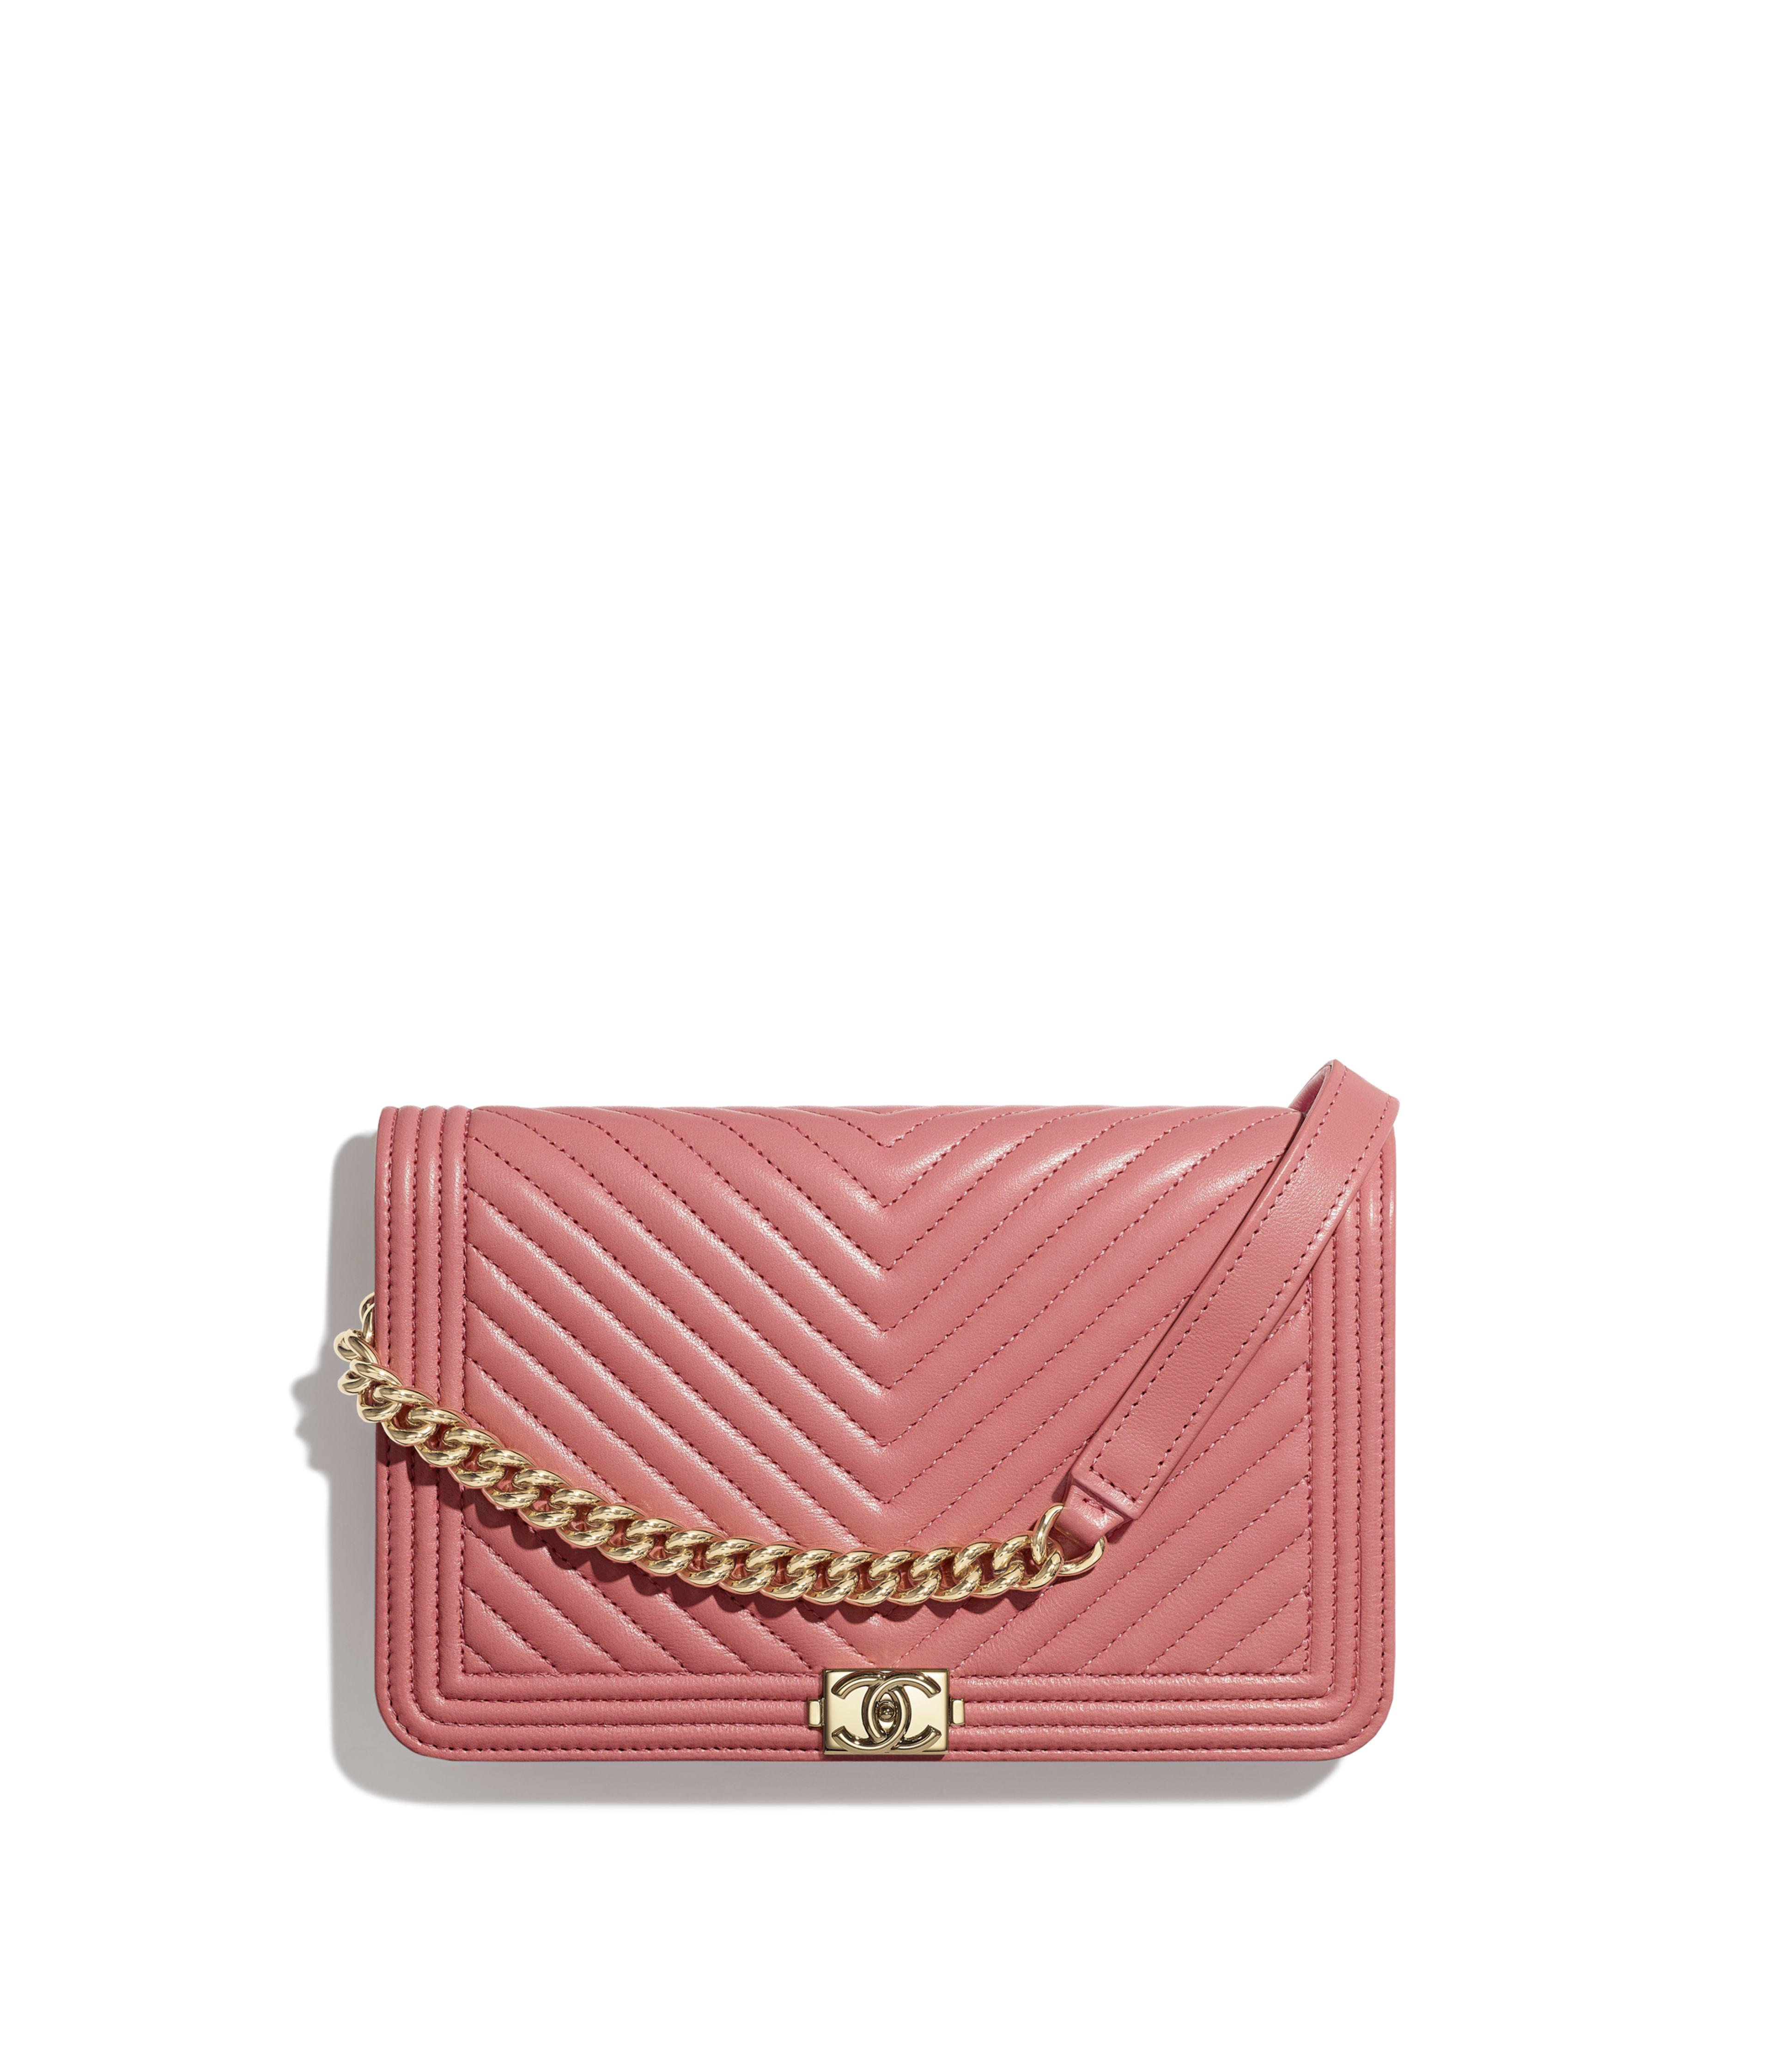 8e9c9bee9a4c3b BOY CHANEL Wallet on Chain Lambskin & Gold-Tone Metal, Pink Ref.  A81969B00635N4704